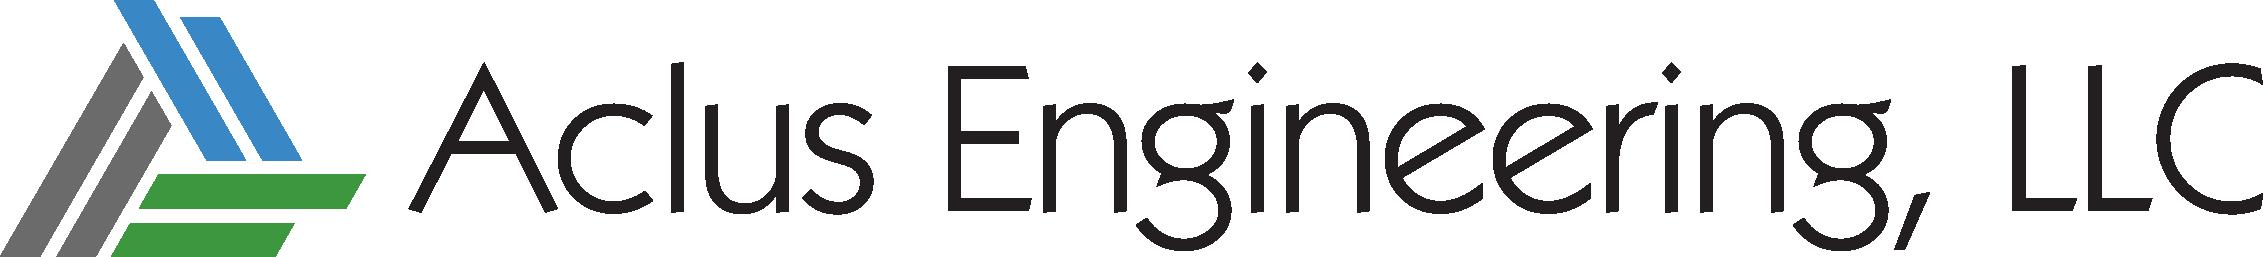 Aclus Engineering logo.png